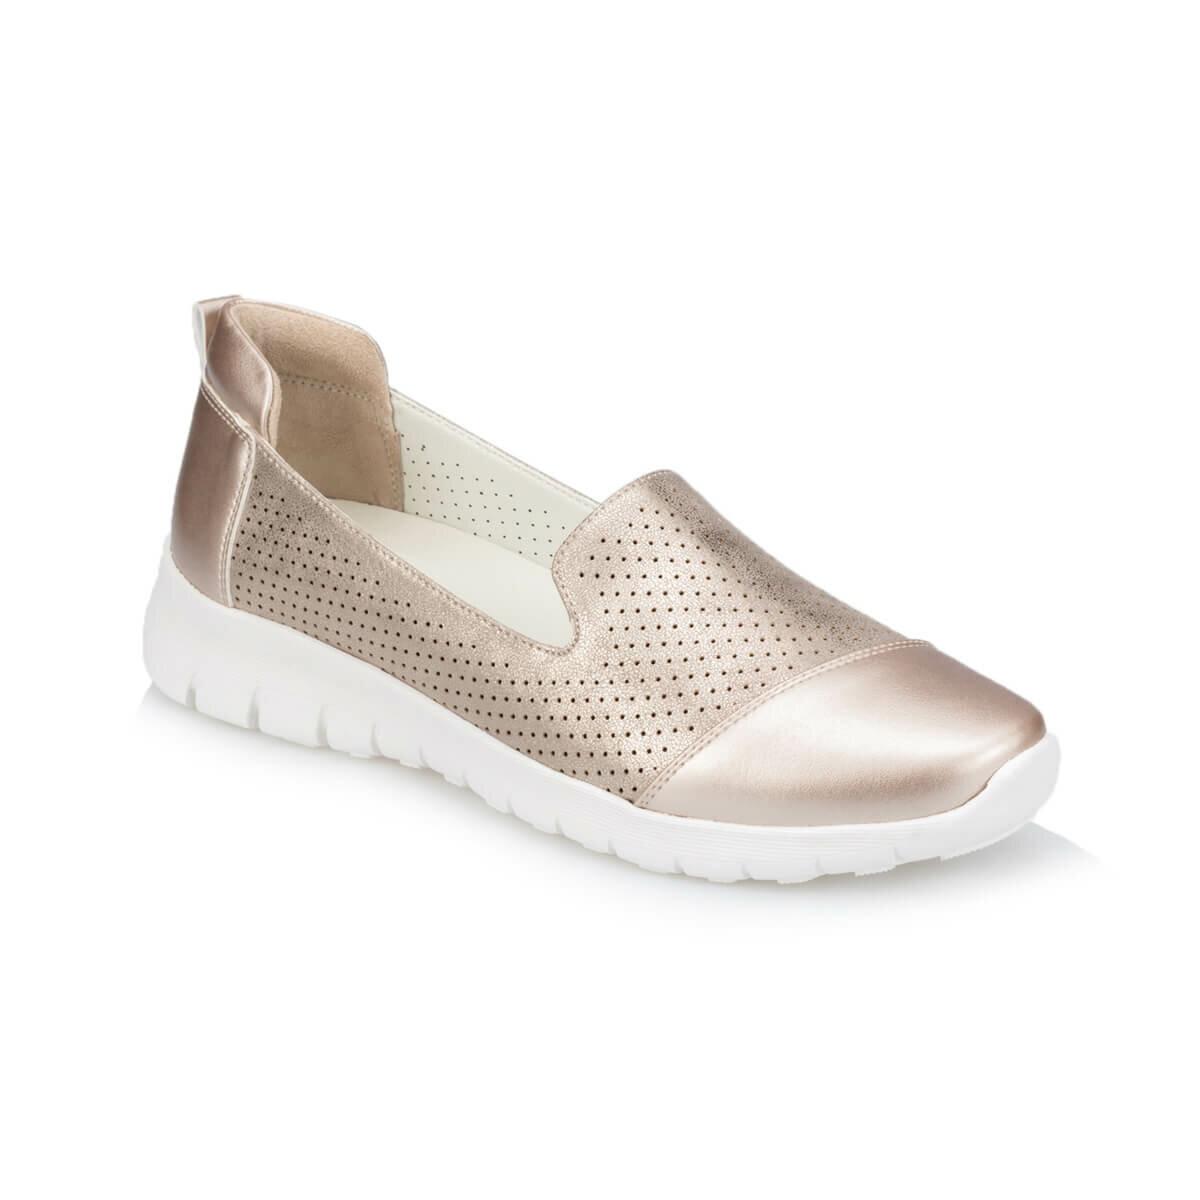 FLO TRV910029 Gold Women 'S Shoes Polaris